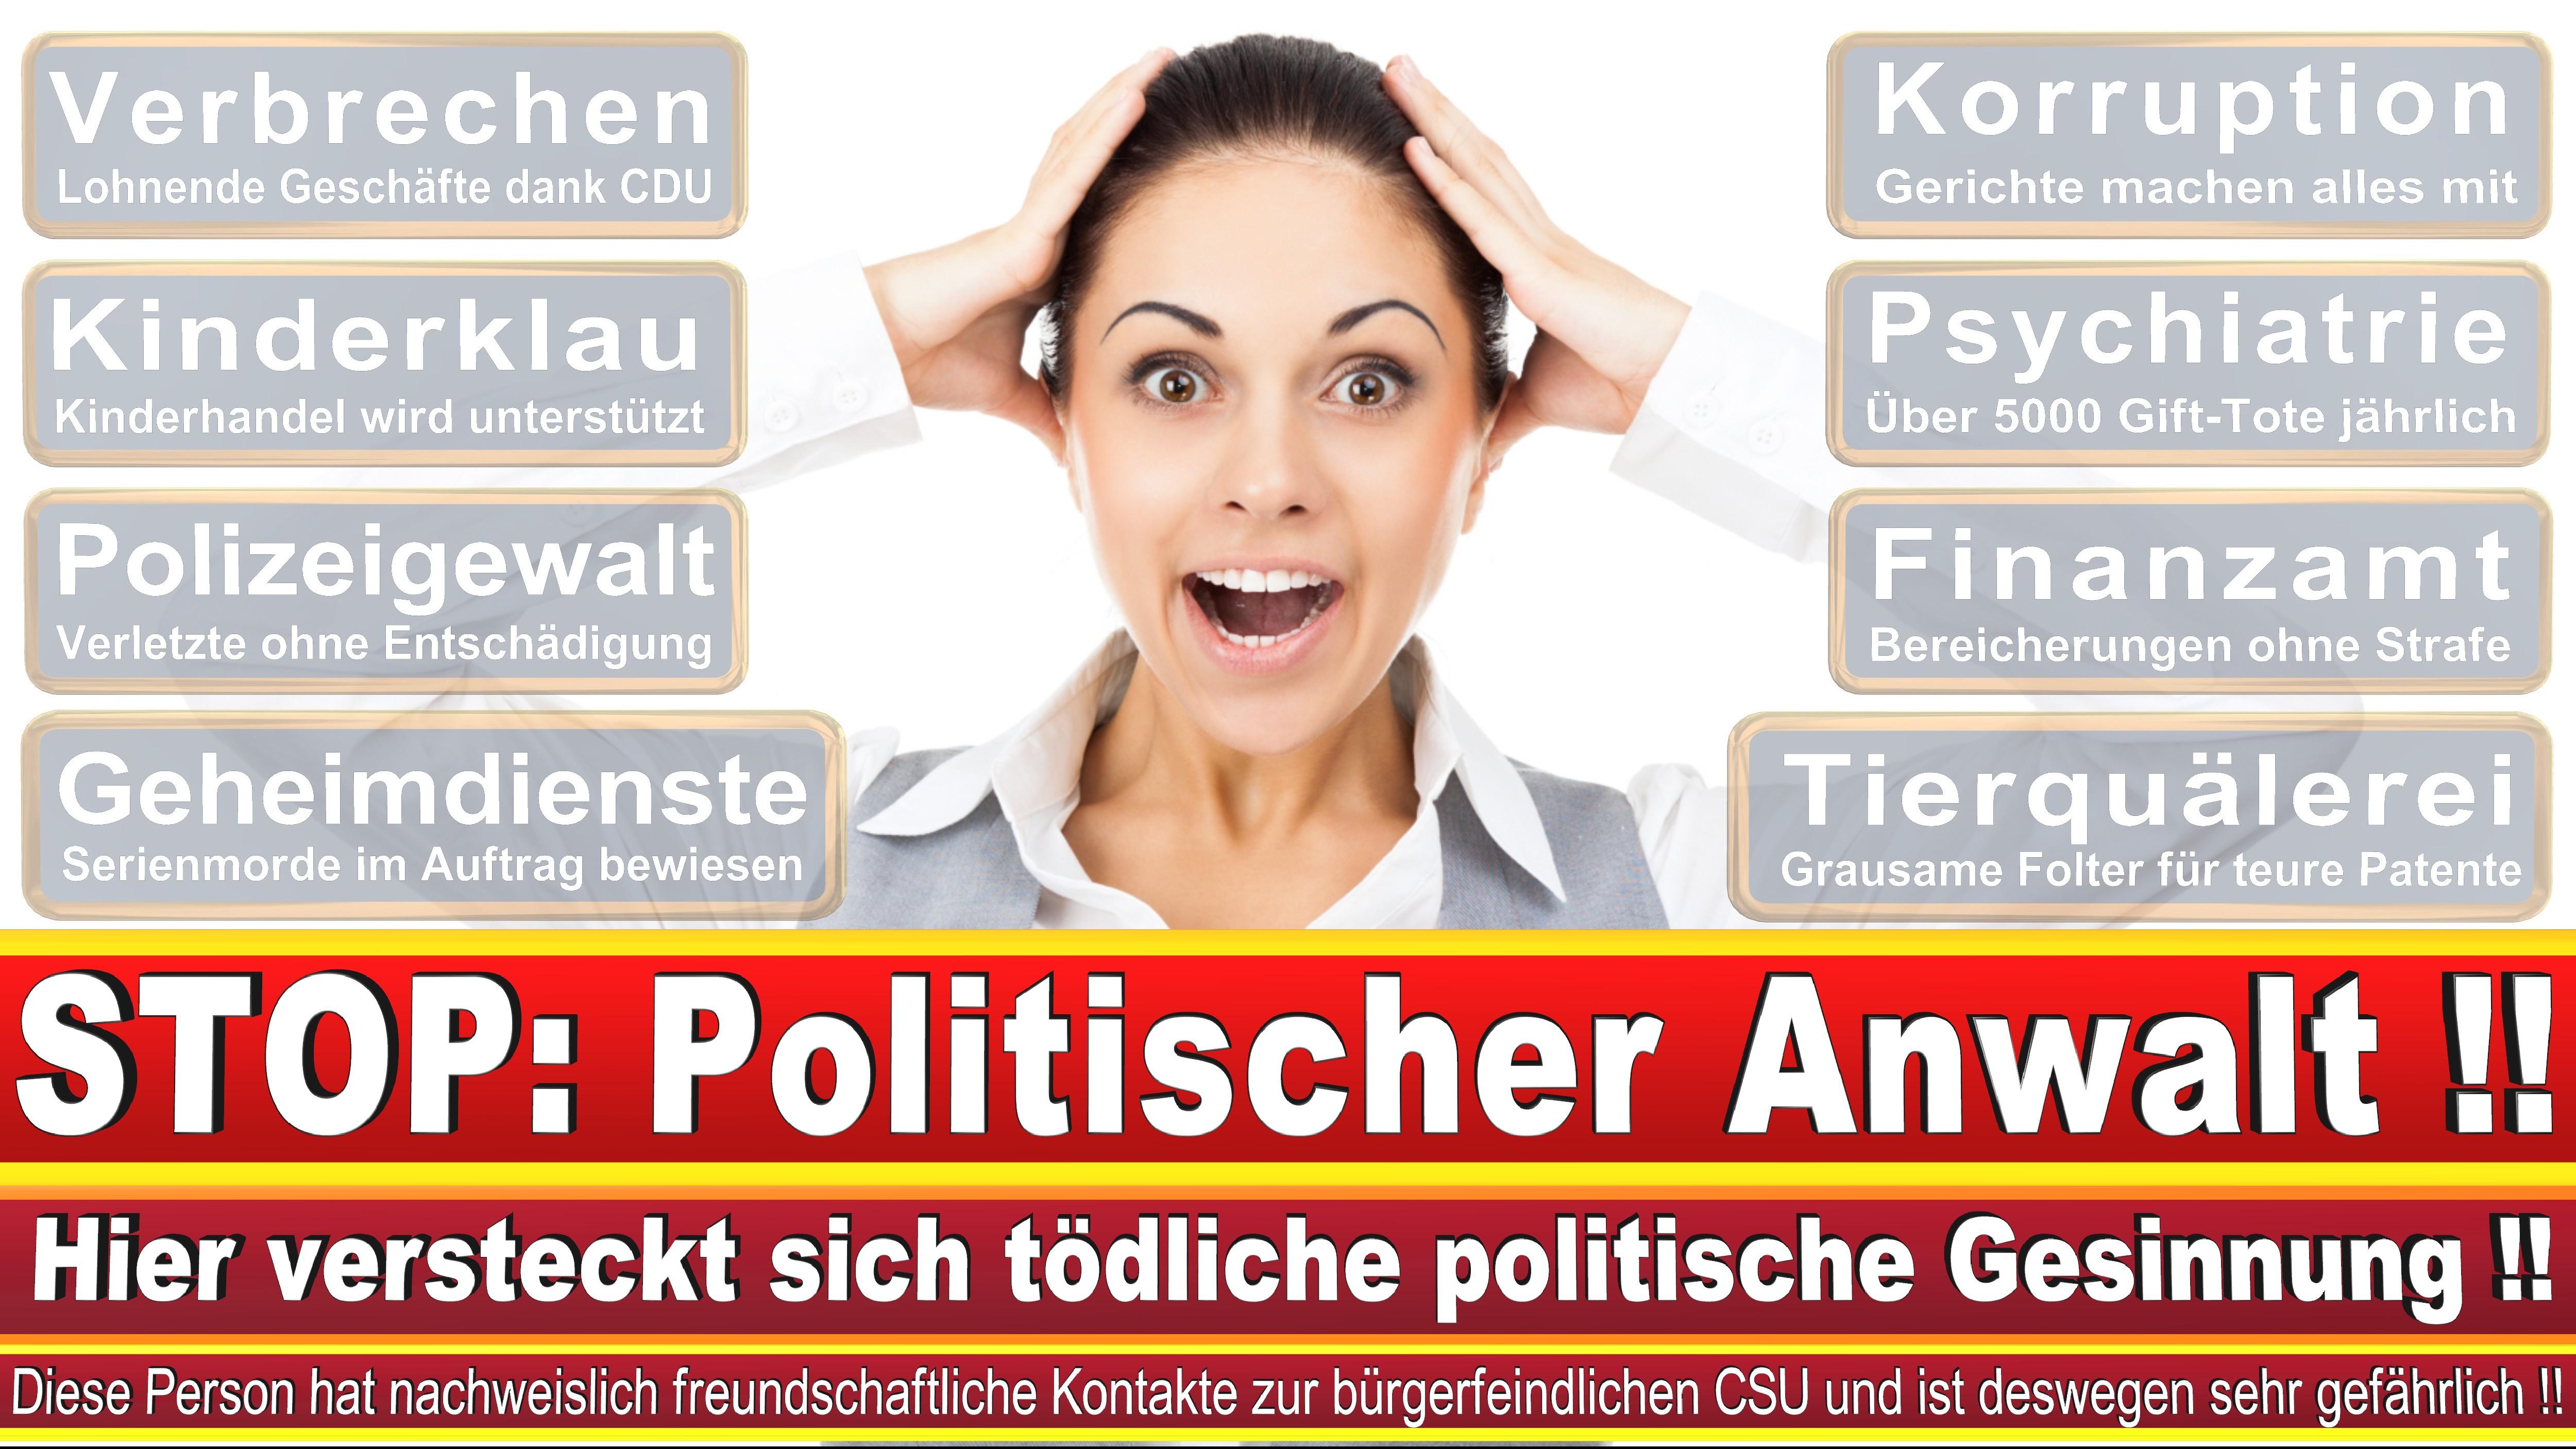 Rechtsanwalt Simon Geyer Landshut Altdorf Selbstständig Rechtsanwalt GSG Rechtsberatung Steuerberatung 1